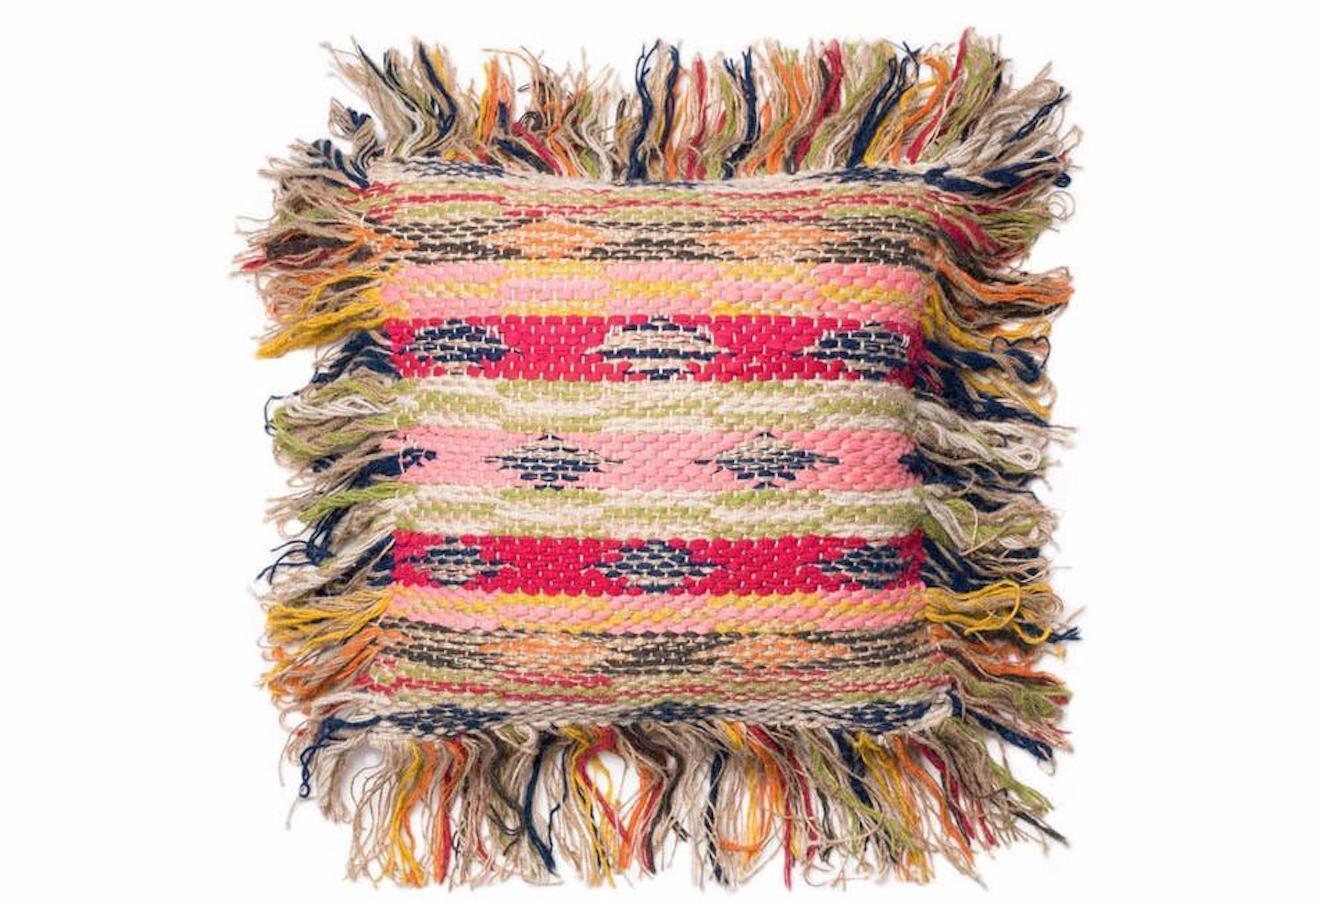 Loloi Fringe Accent Decorative Pillow Down Fill Multicolord Jute 18  x 18   NWT